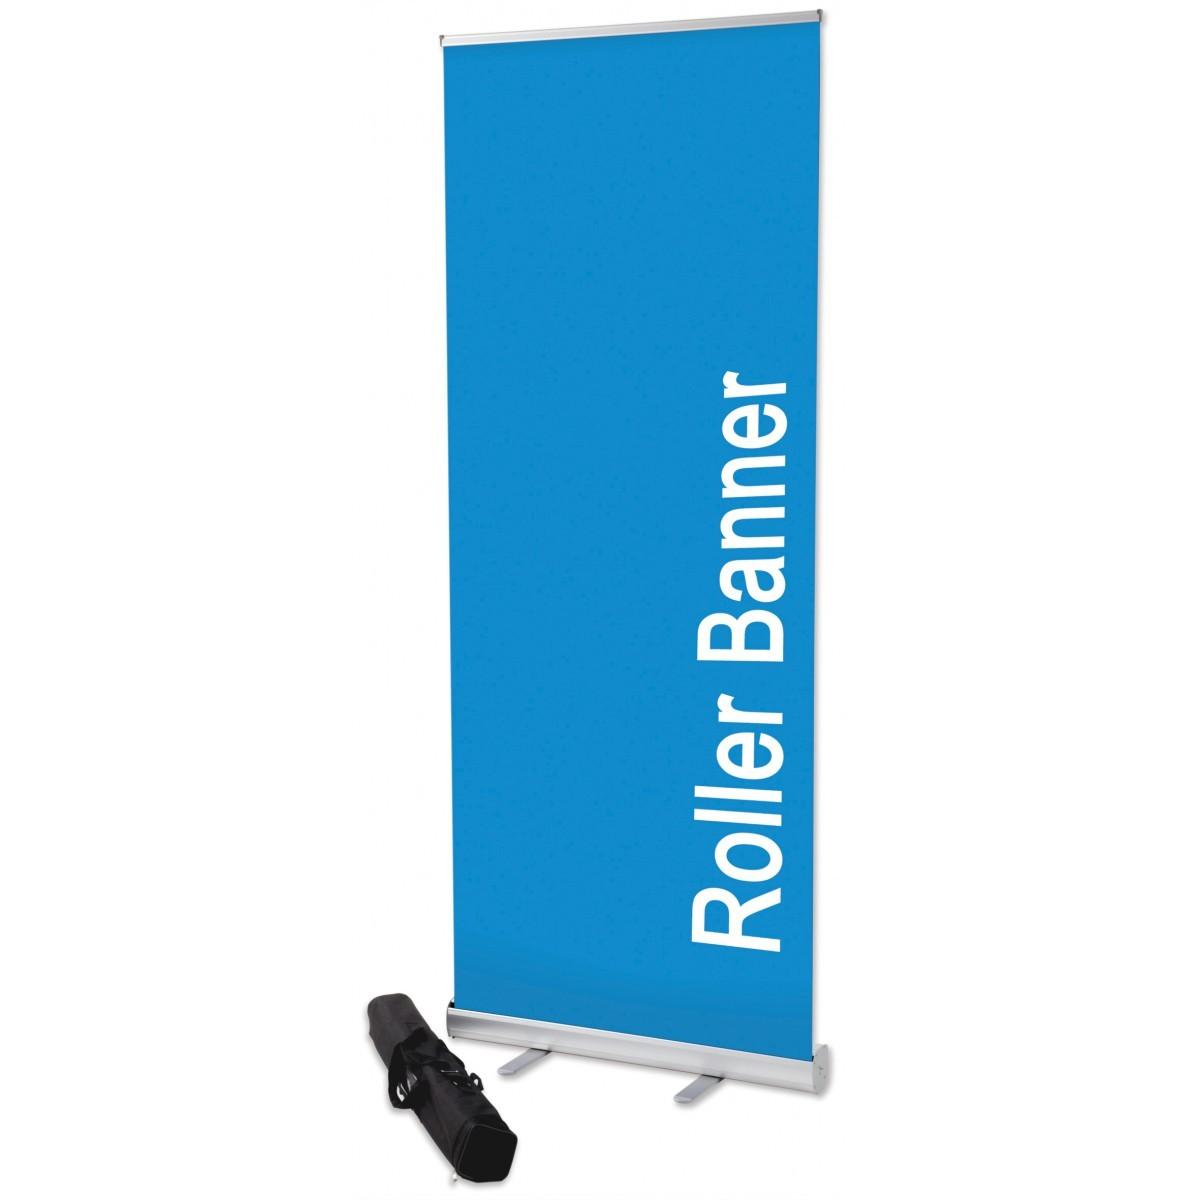 Budget Roll Up Banner  24 hr printing printing sameday